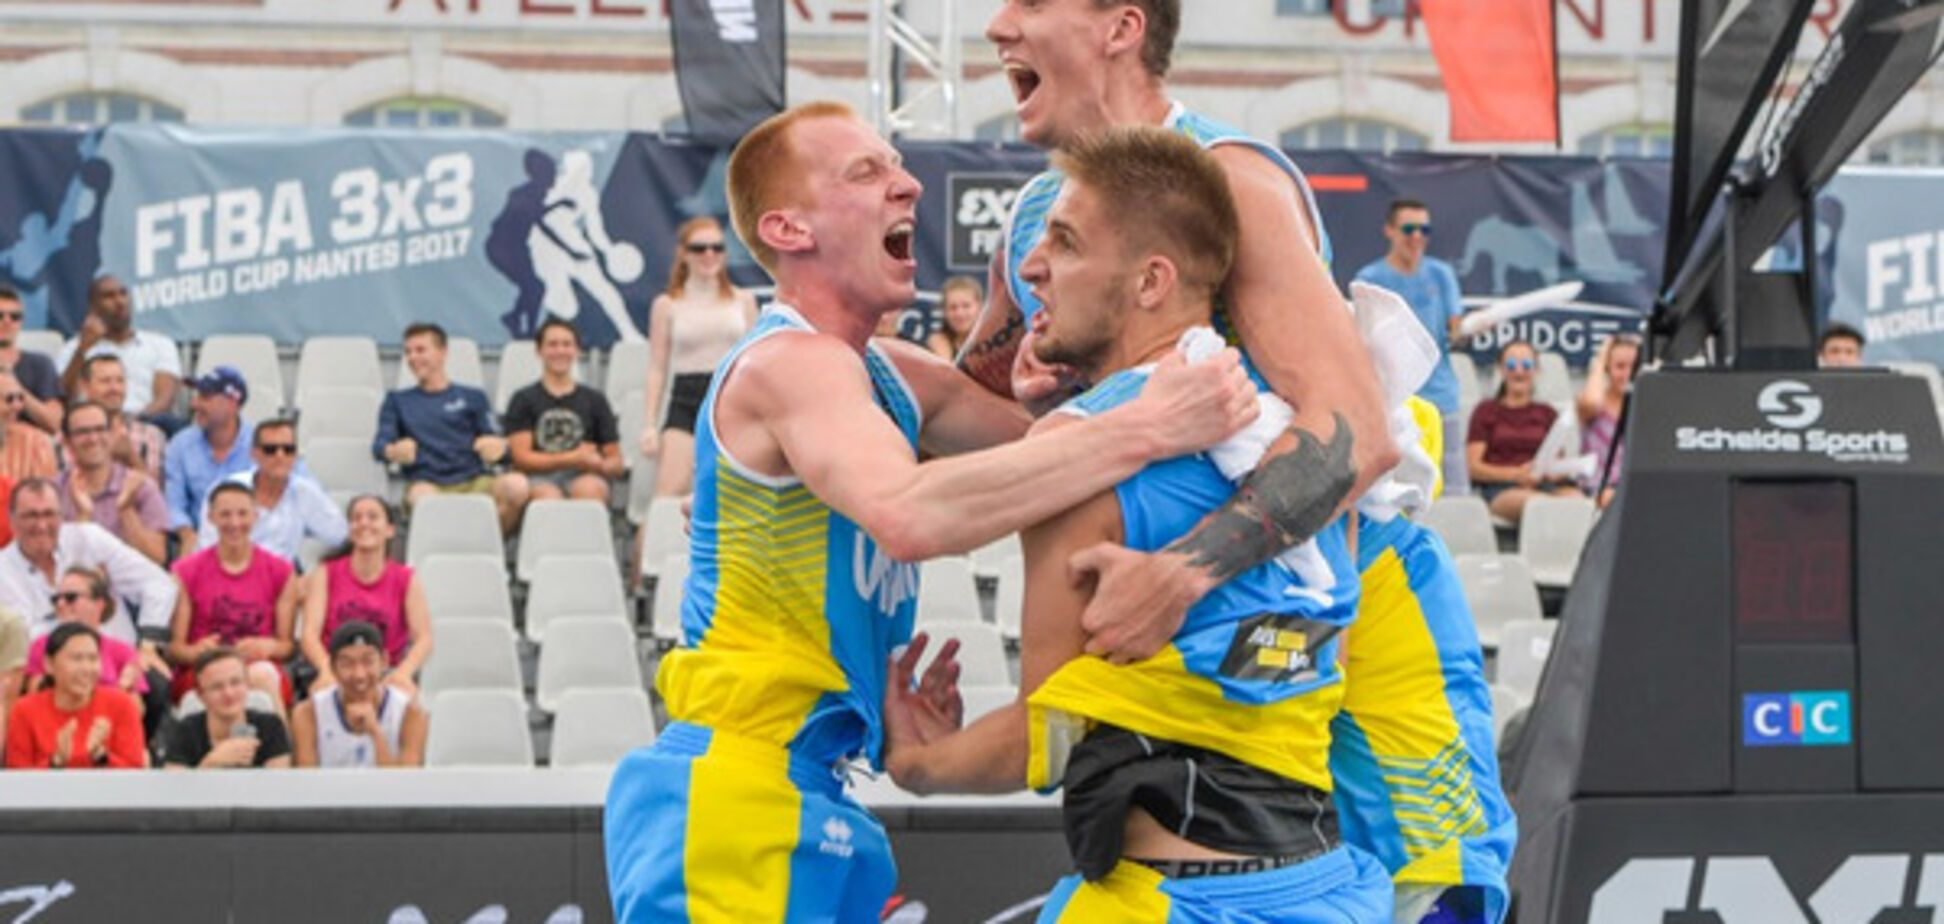 збірна України з баскетболу 3х3